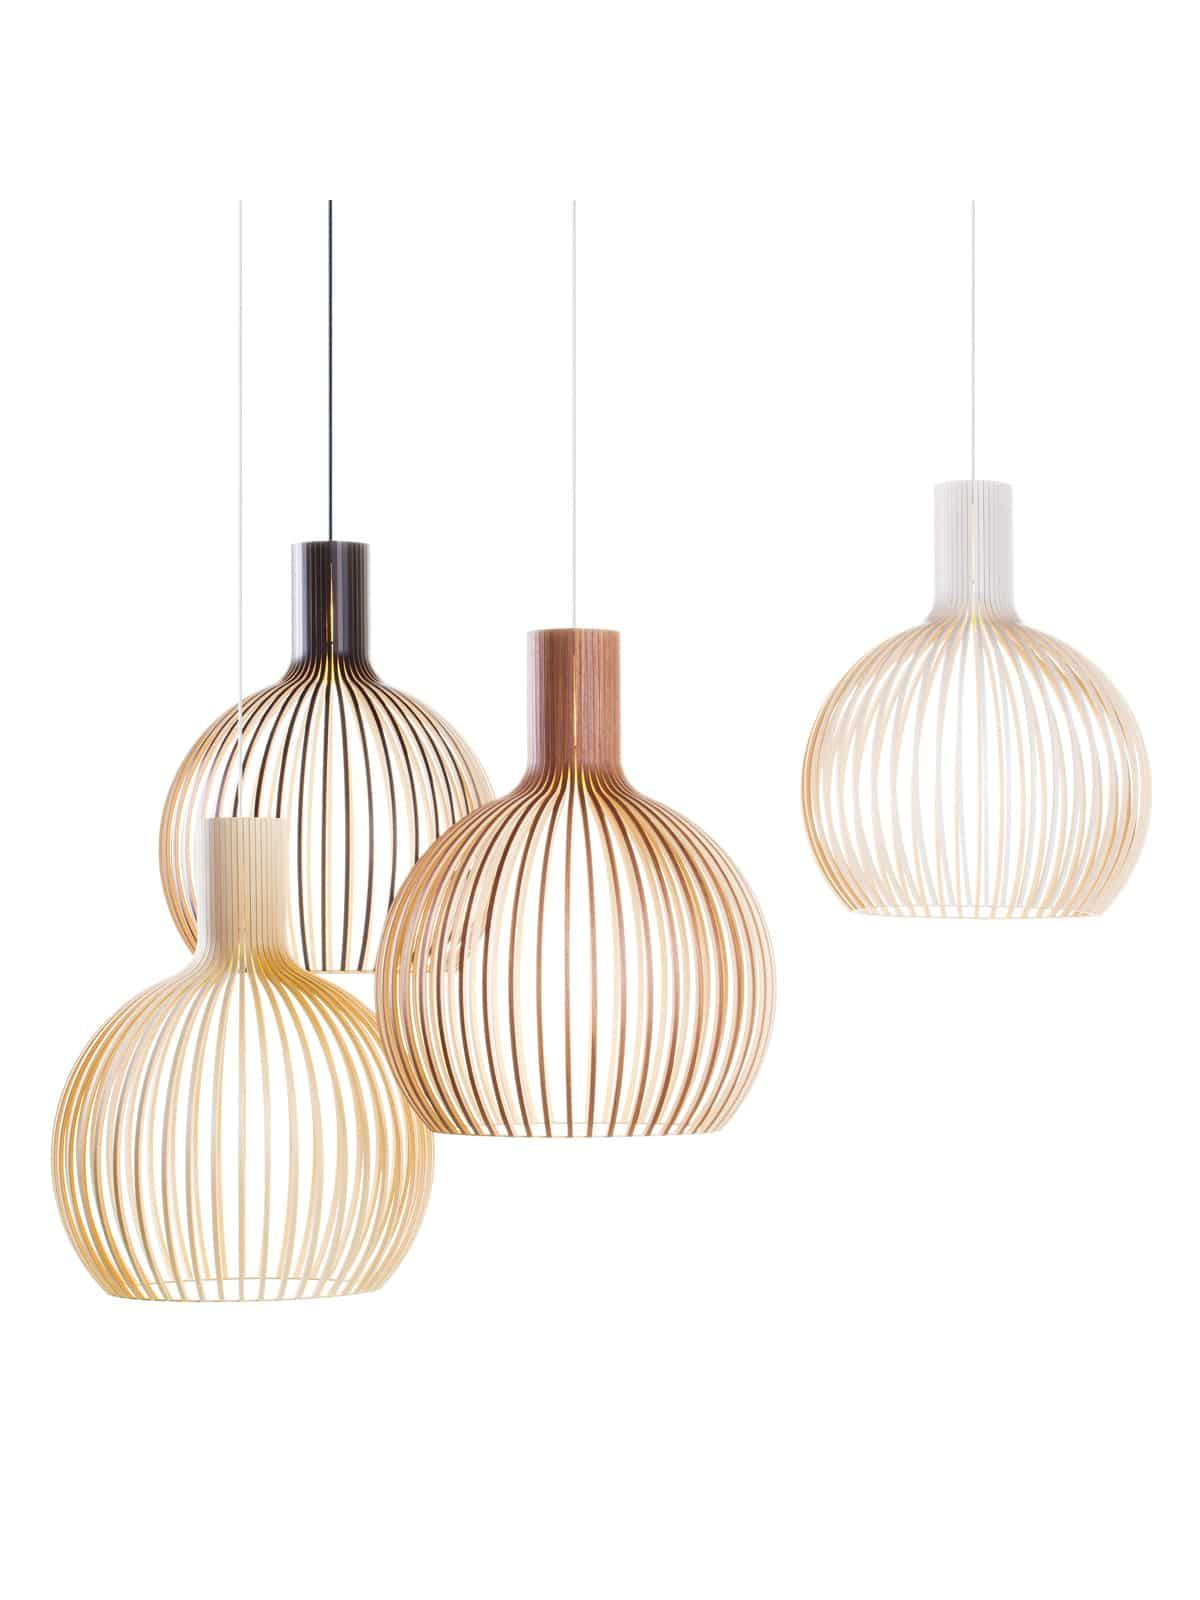 OCTO 4 Secto Design - Lampen Leuchten Designerleuchten Berlin